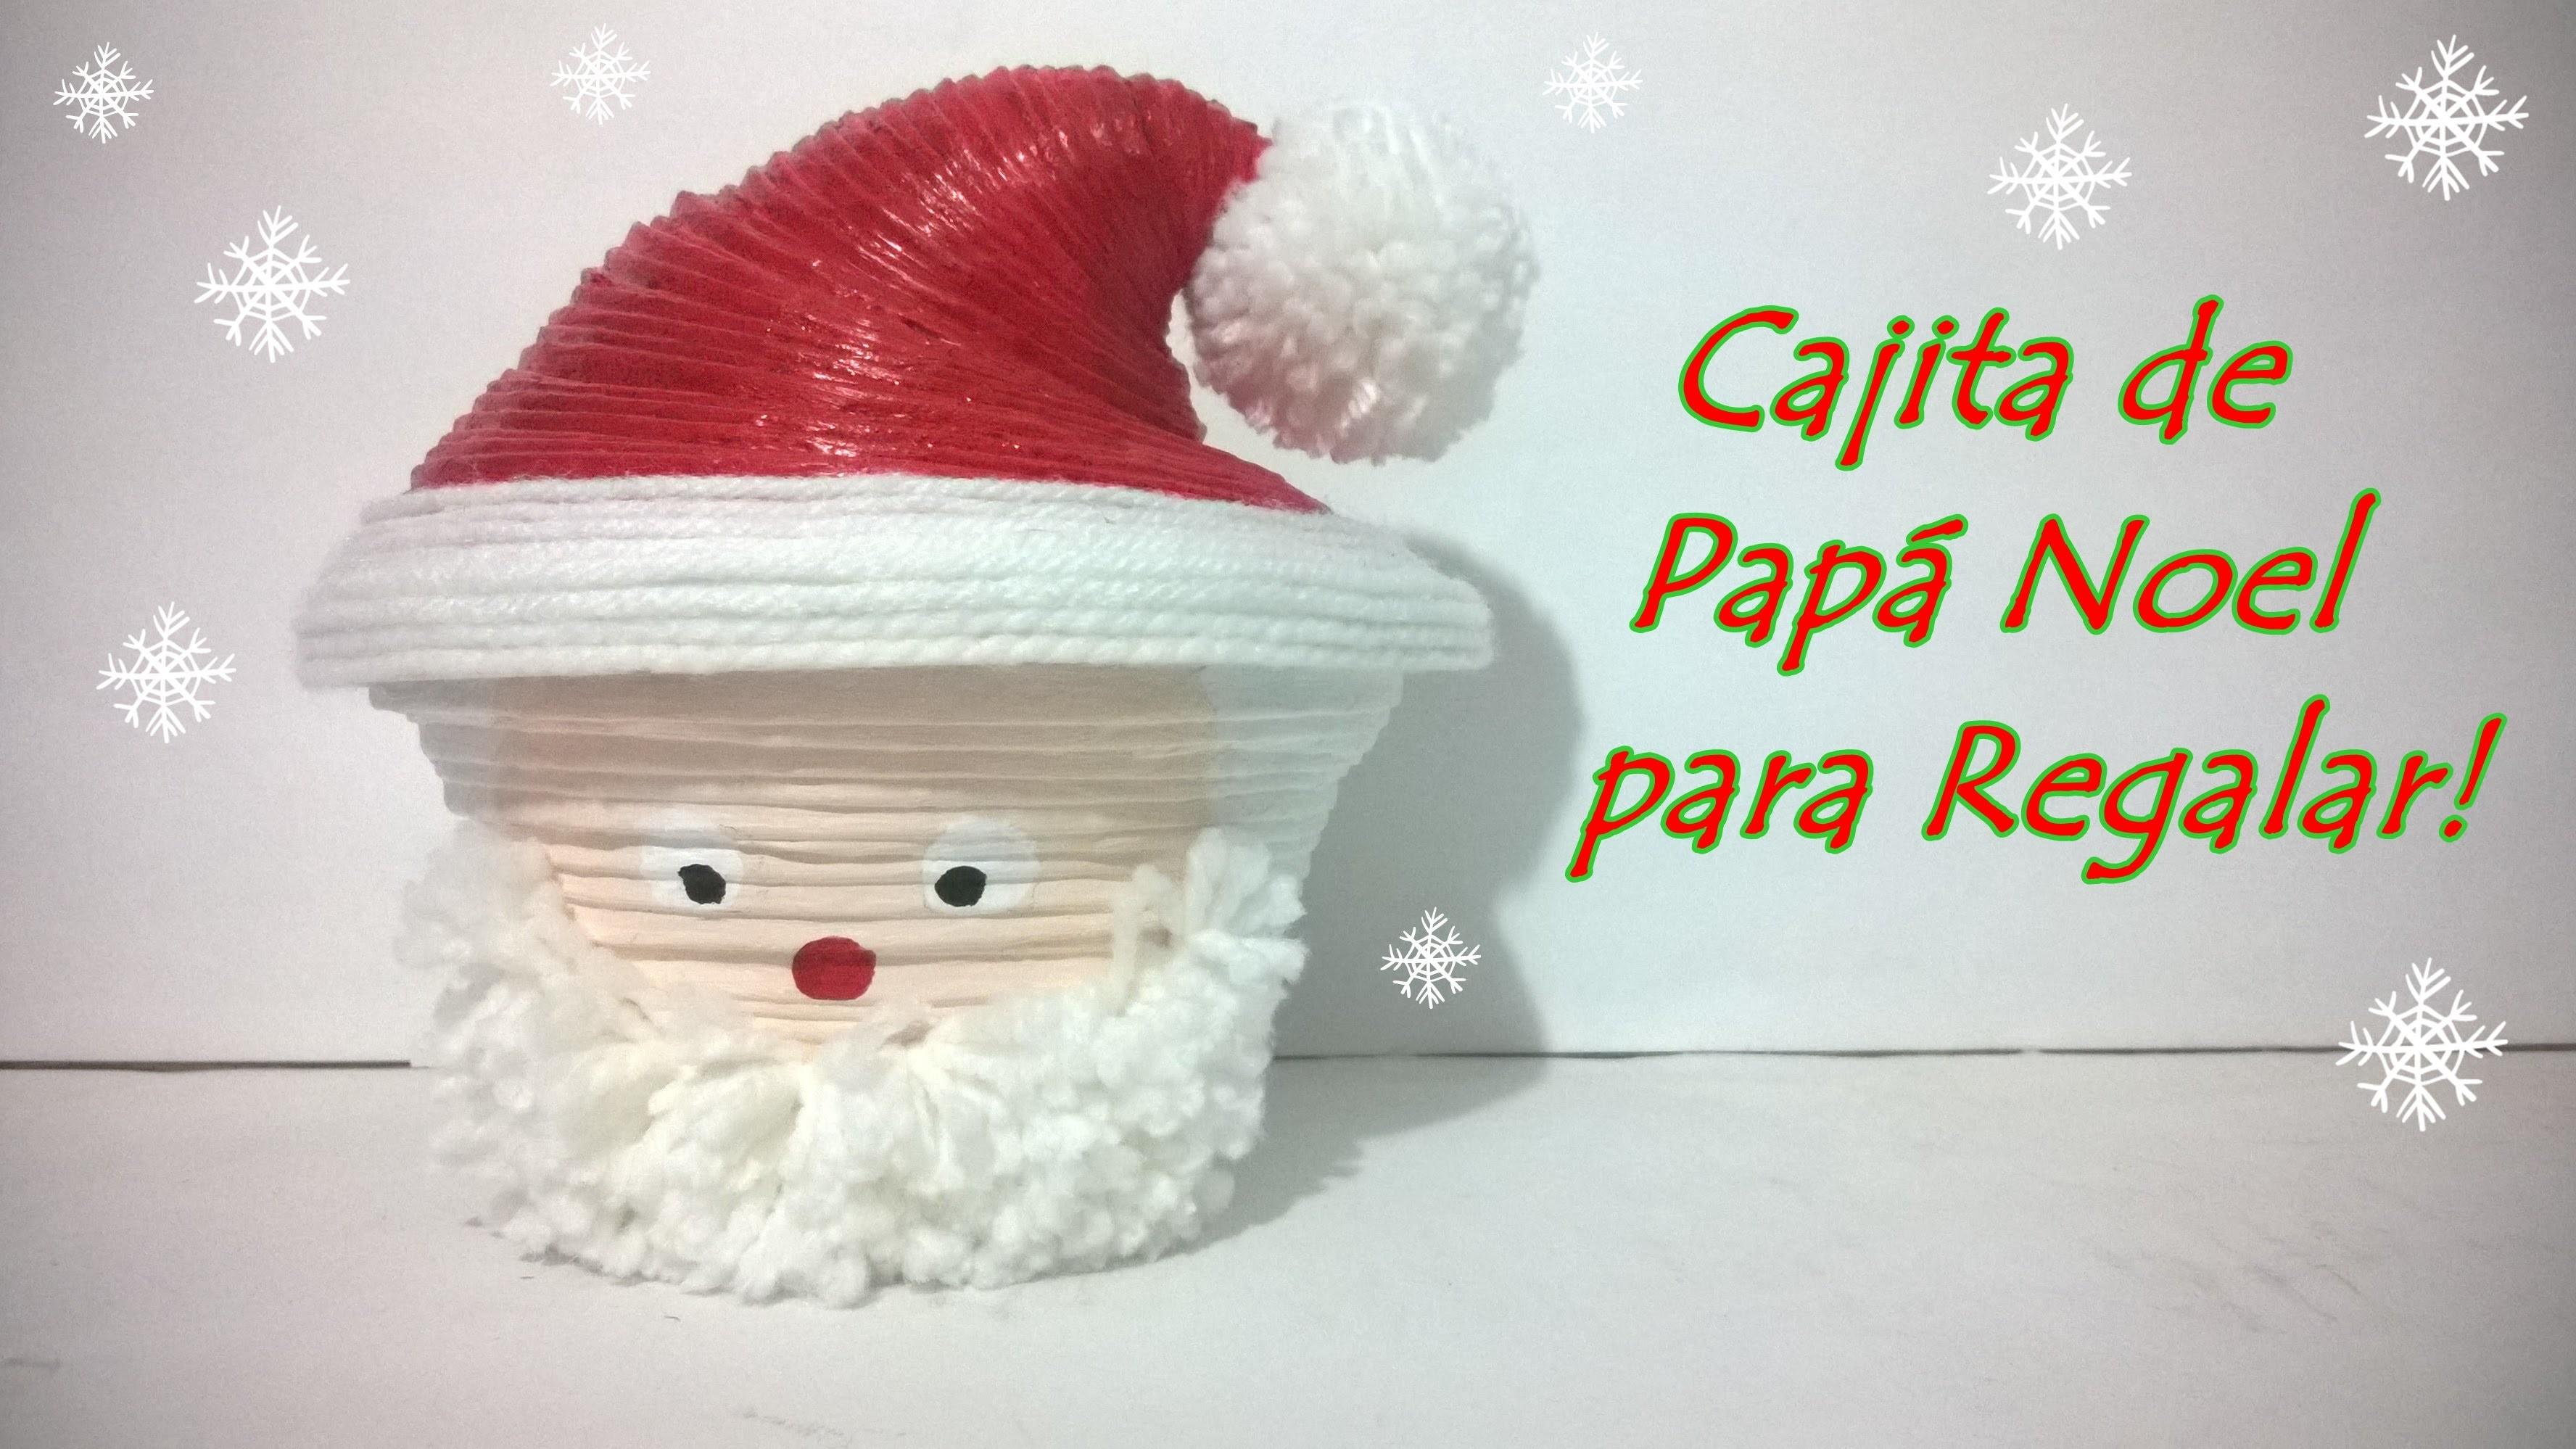 Cajita de Papa Noel para regalar! - Aprende a hacer esta bella cajita para dársela a tus  amigos!